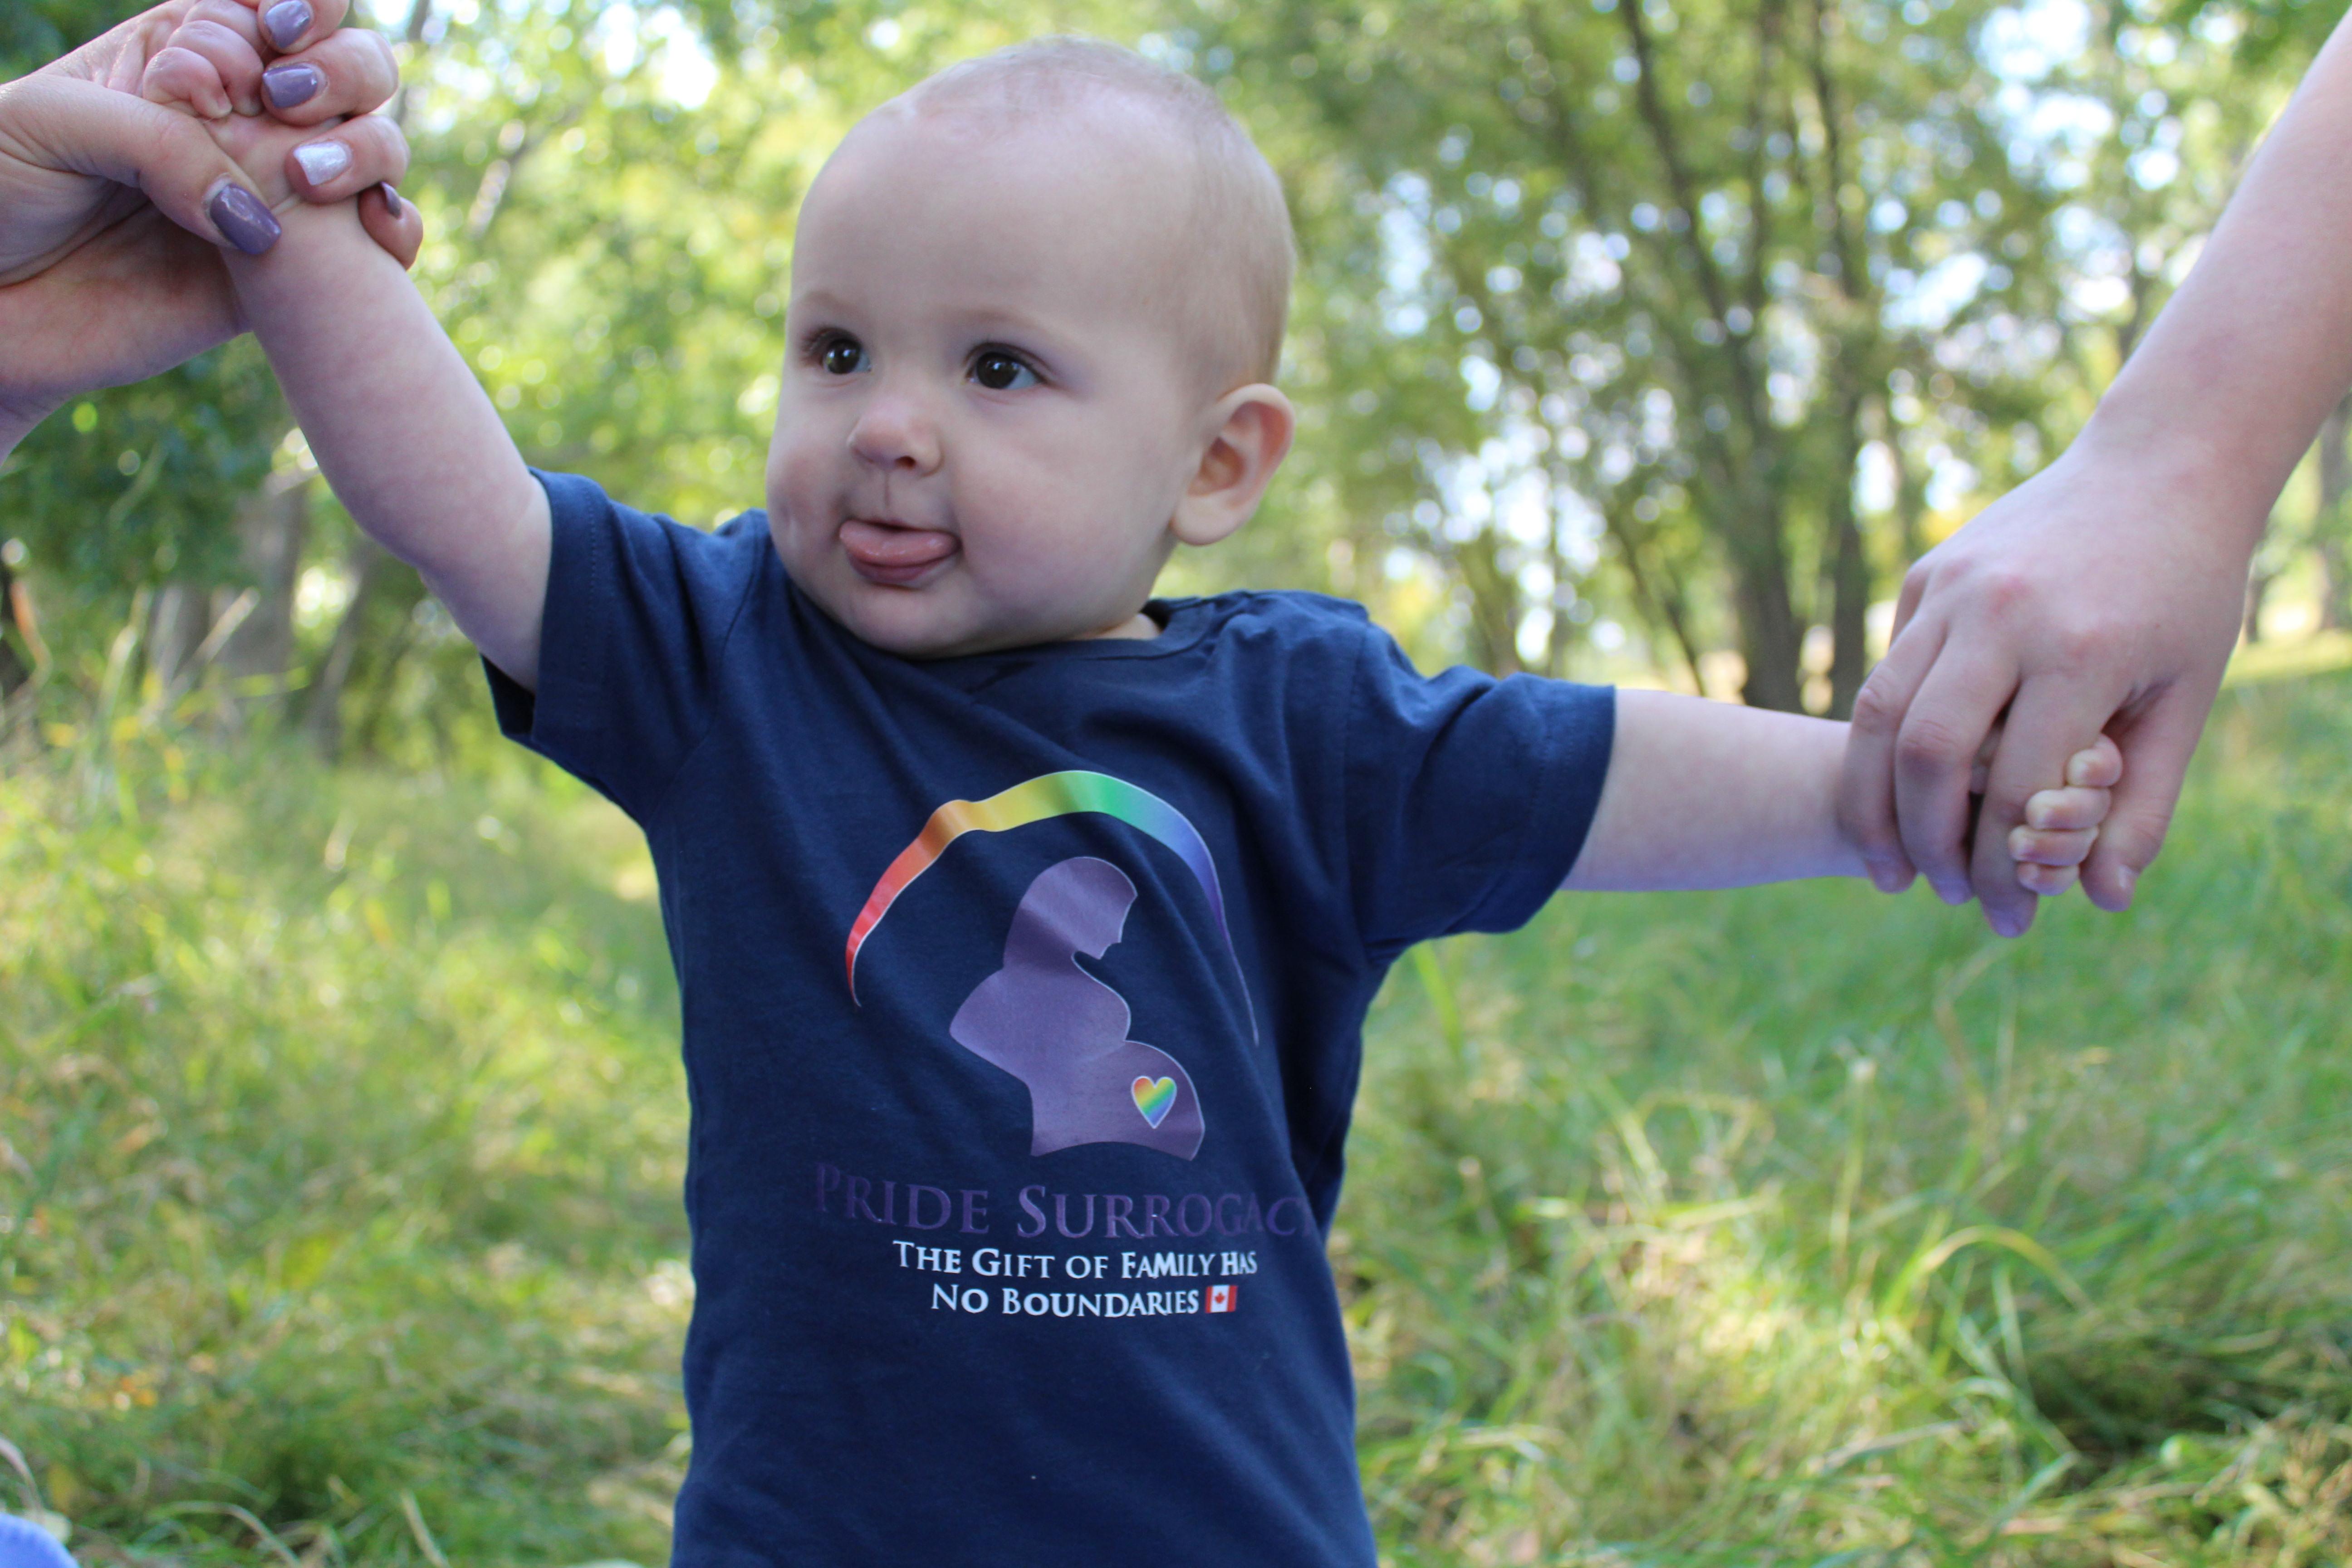 Surrogate baby - Pride Surrogacy - Gay Surrogacy in Canada